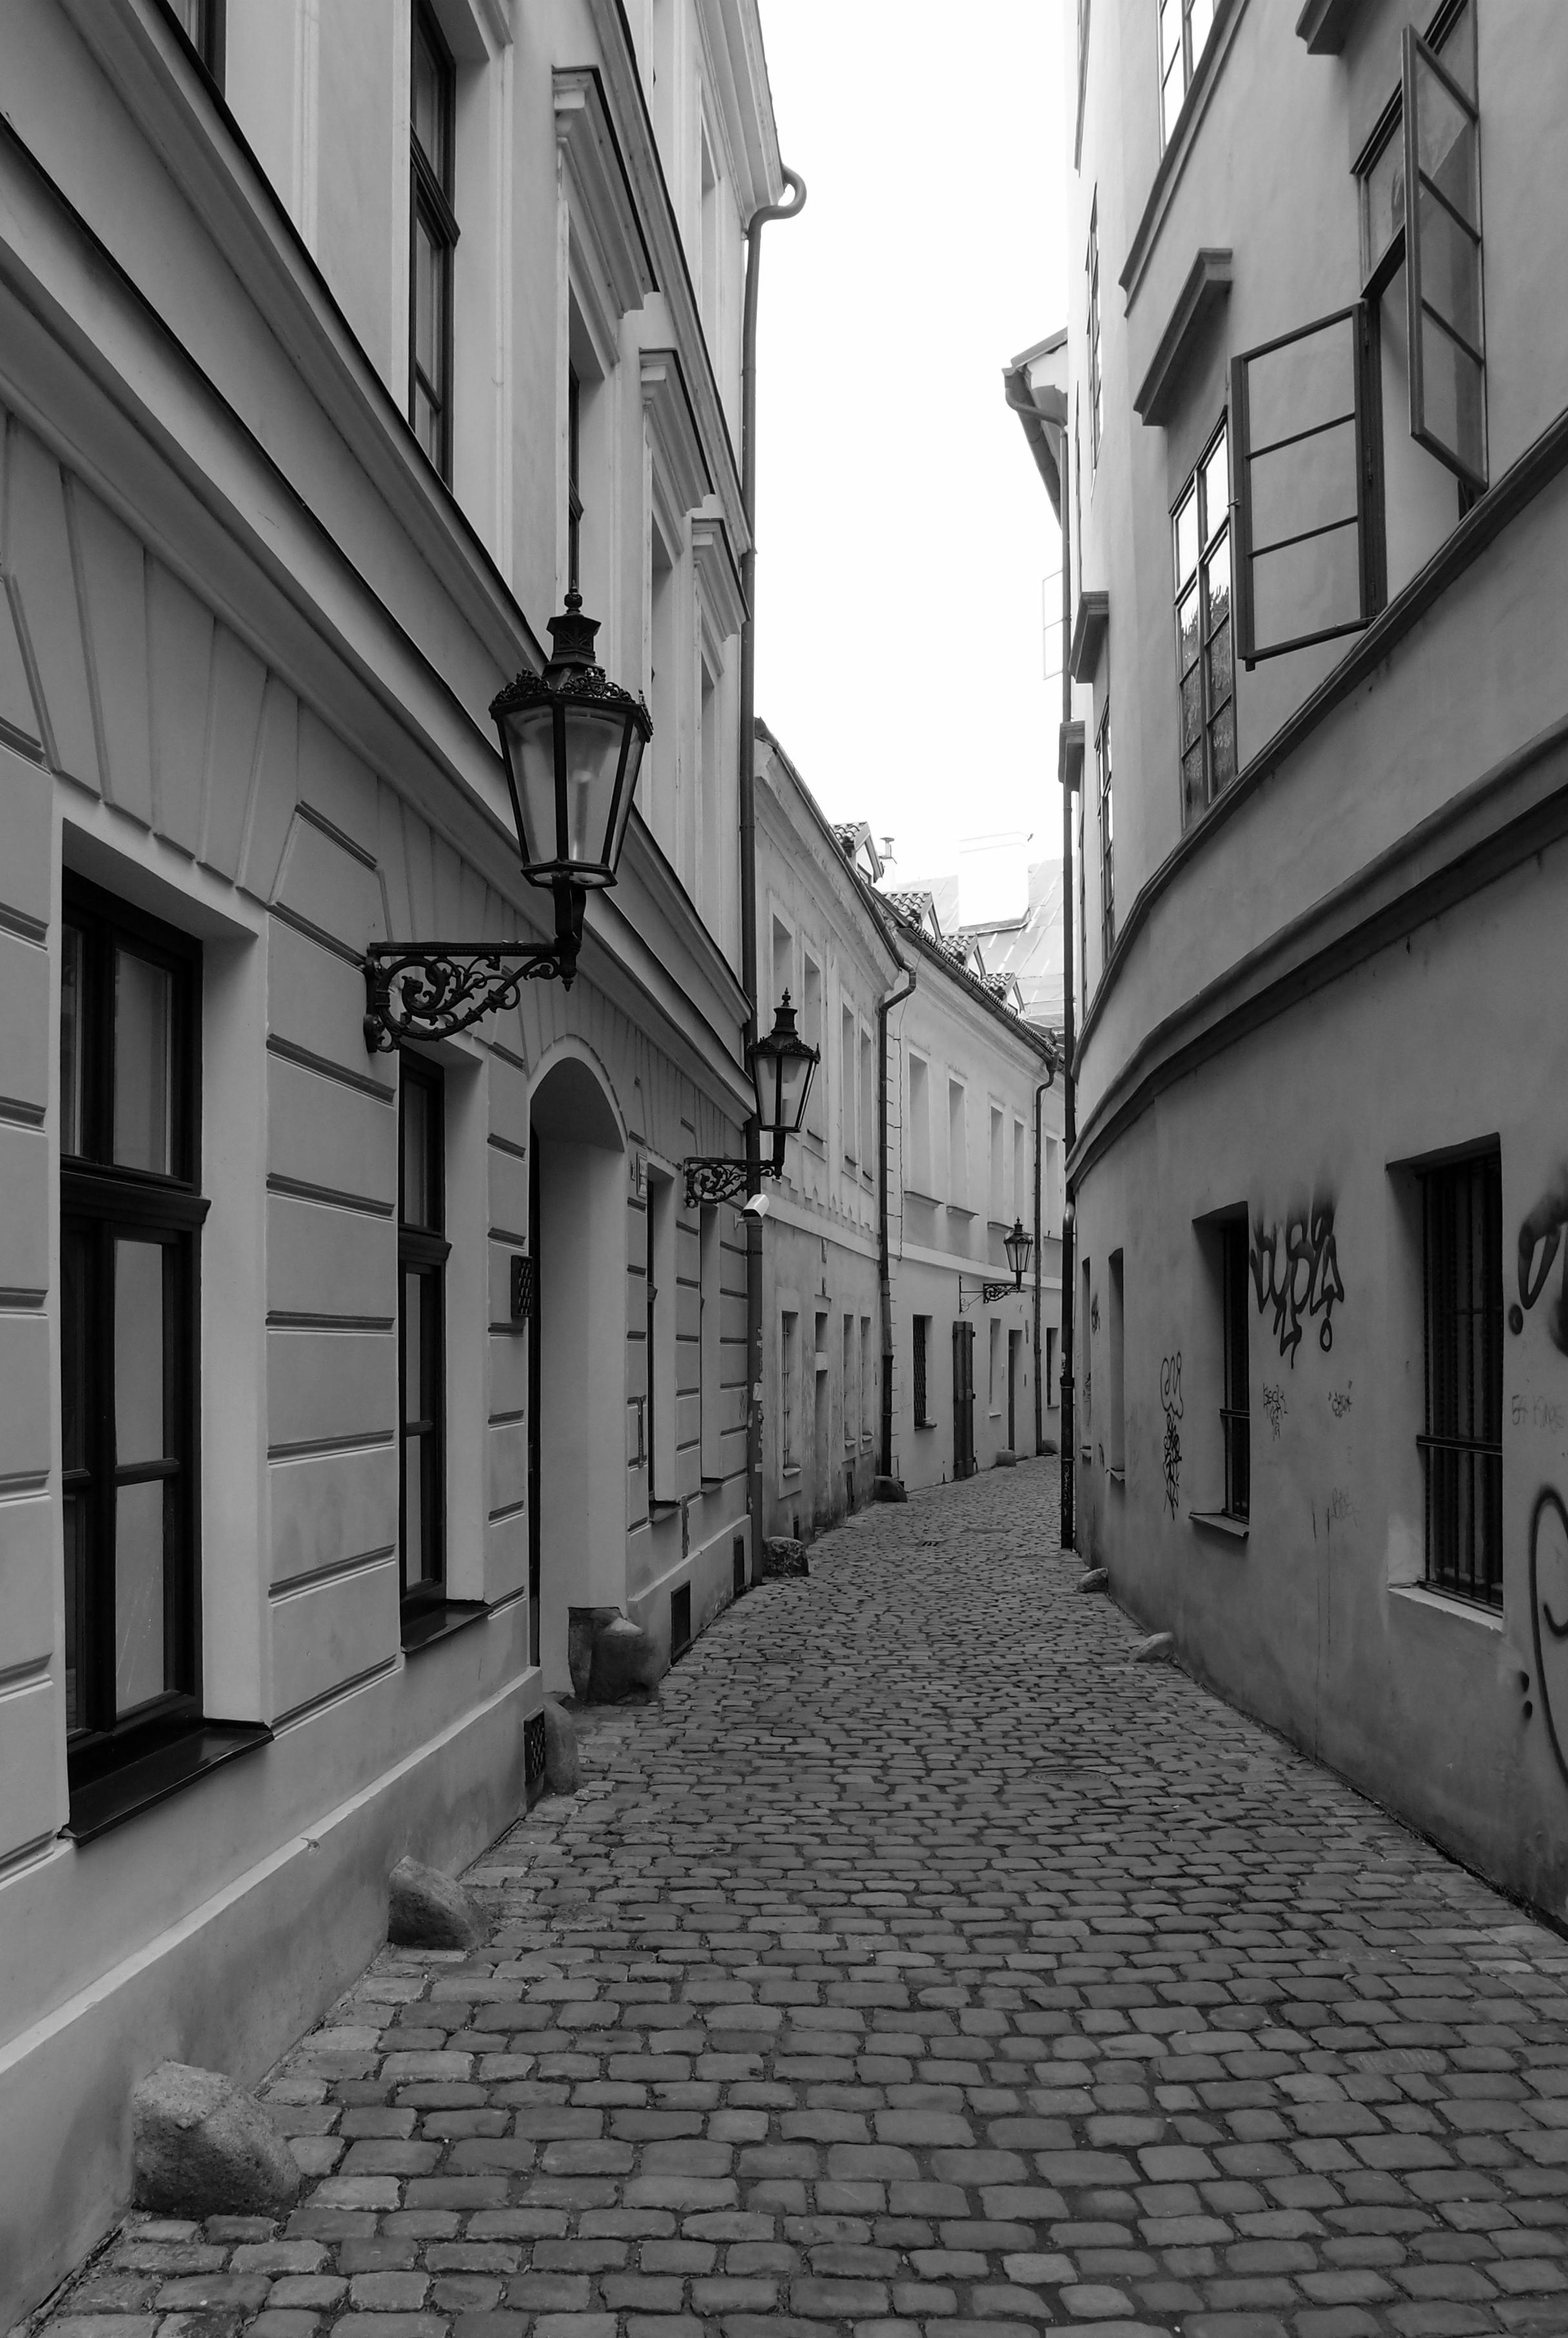 Gallery - /Prague/Narrow street